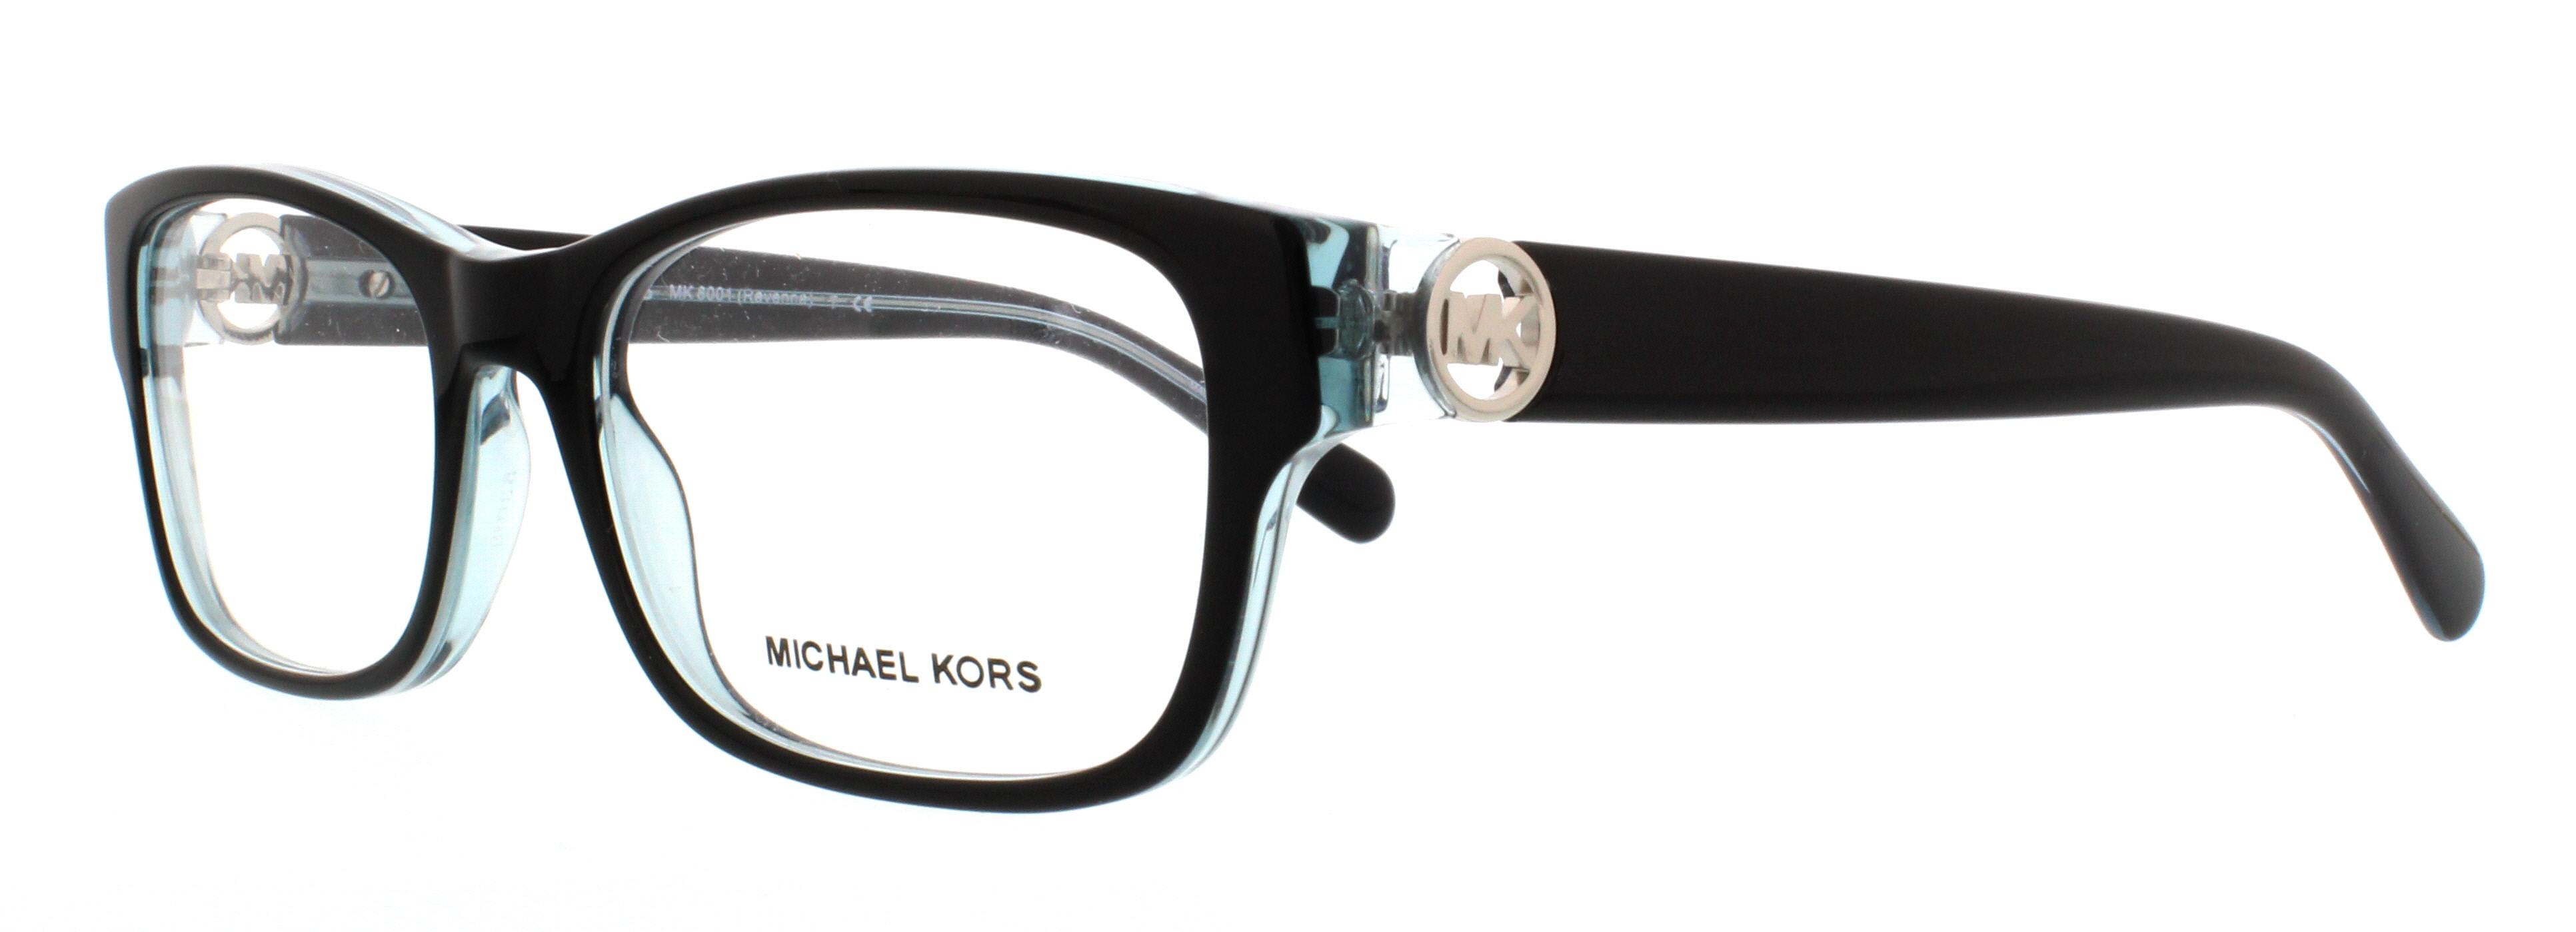 MICHAEL KORS Eyeglasses MK8001 RAVENNA 3001 Black Blue 53MM ...